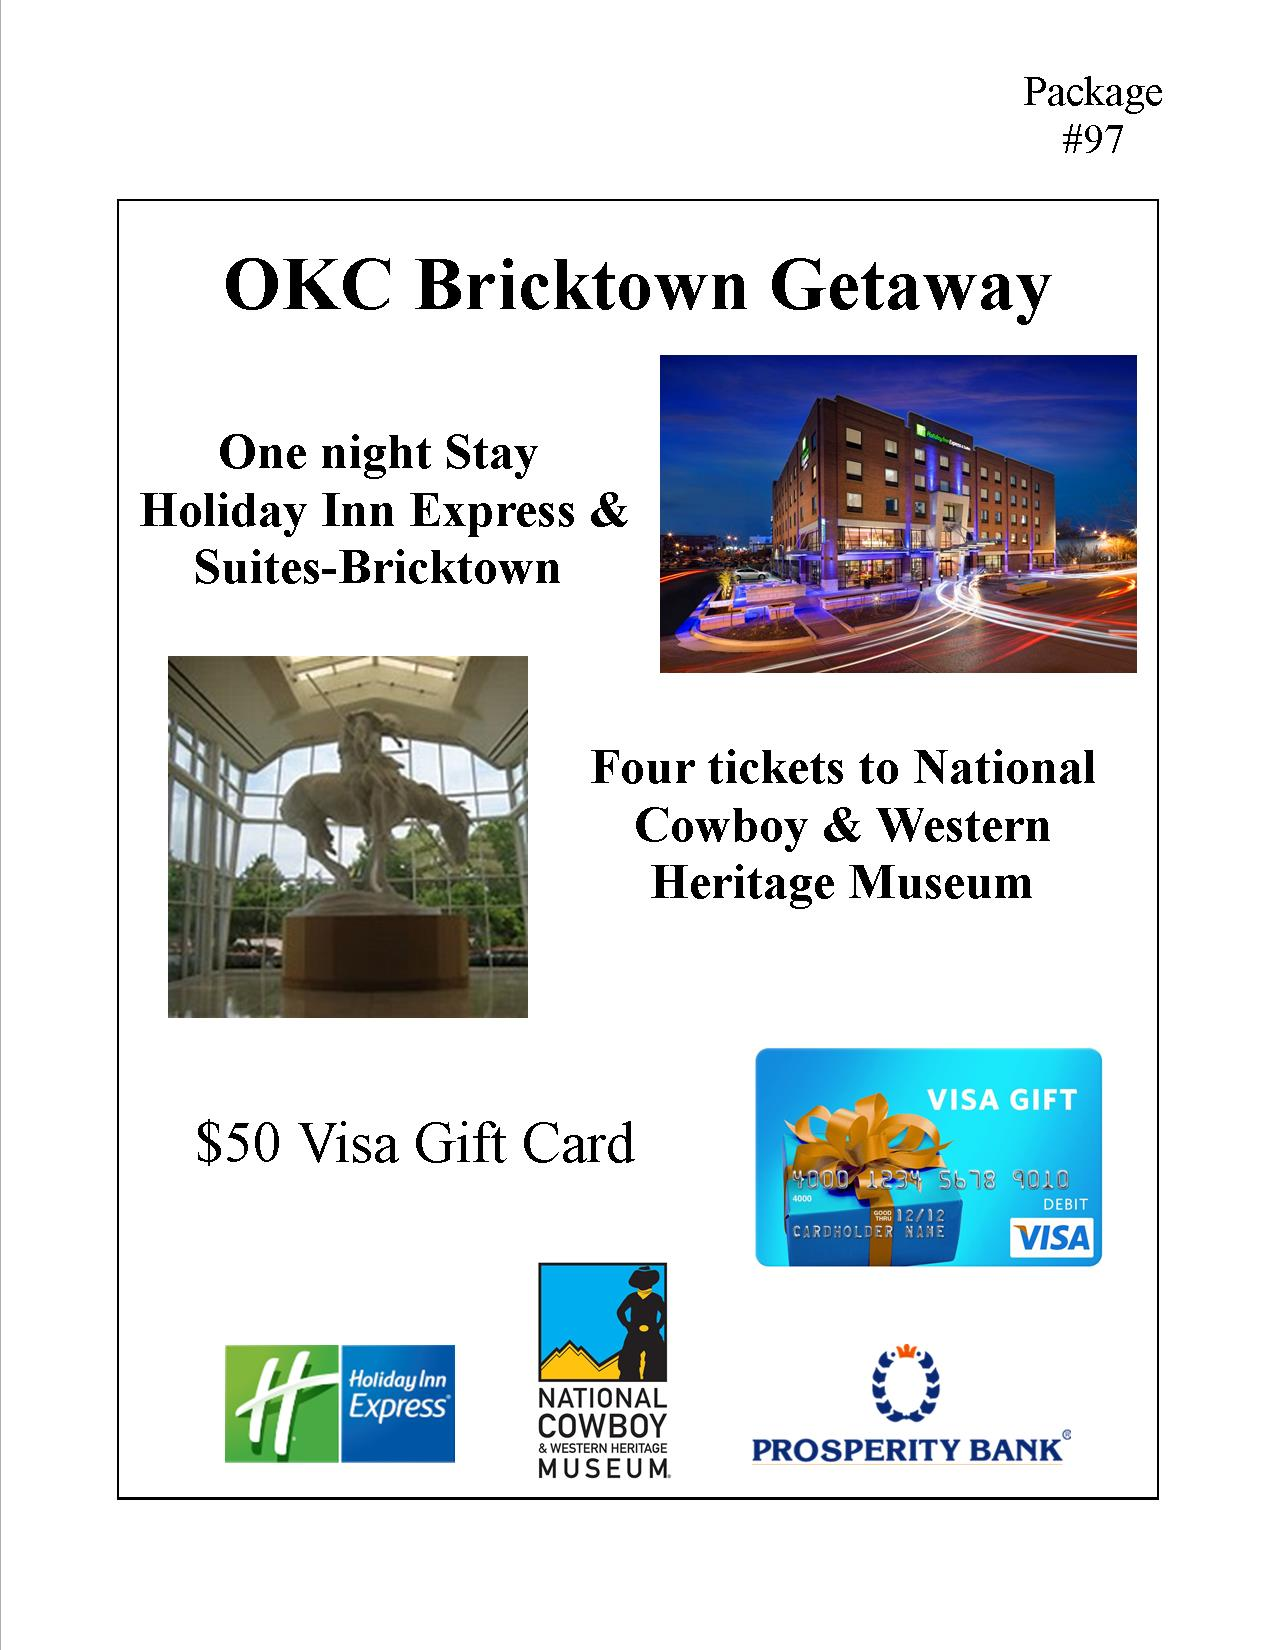 OKC Bricktown Getaway #97.jpg